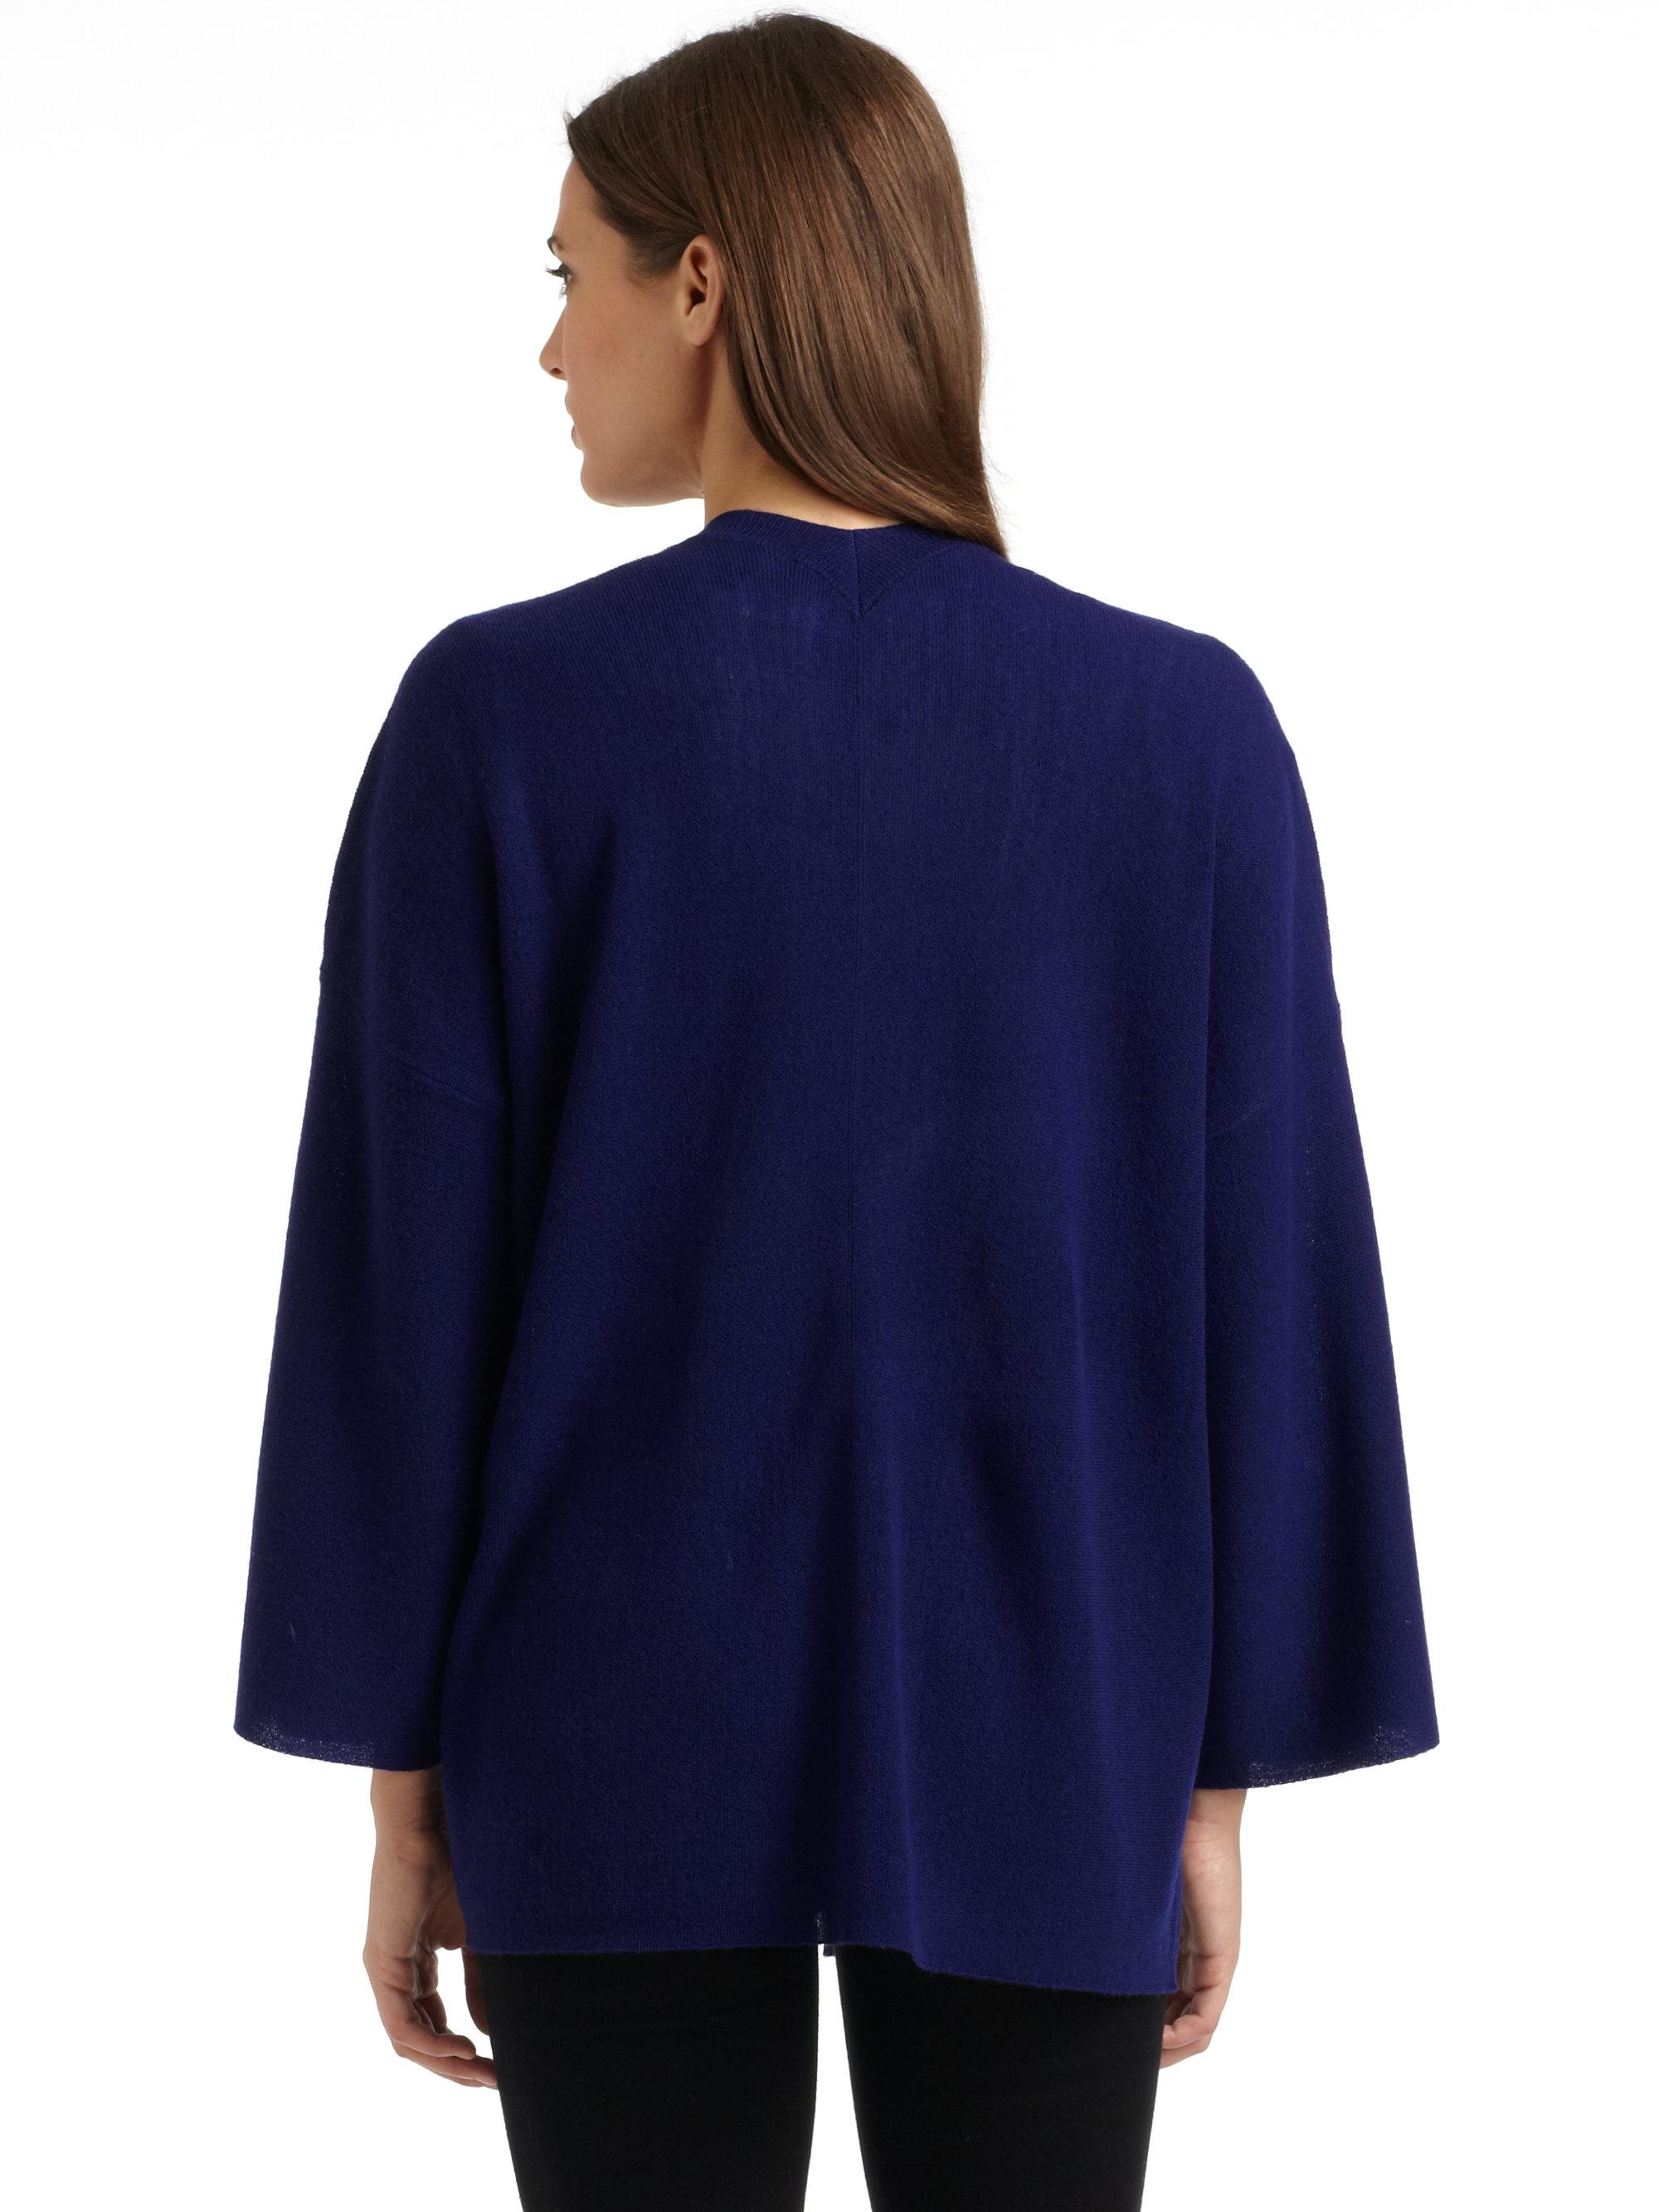 Eileen fisher Merino Wool Kimono Cardigan in Blue   Lyst